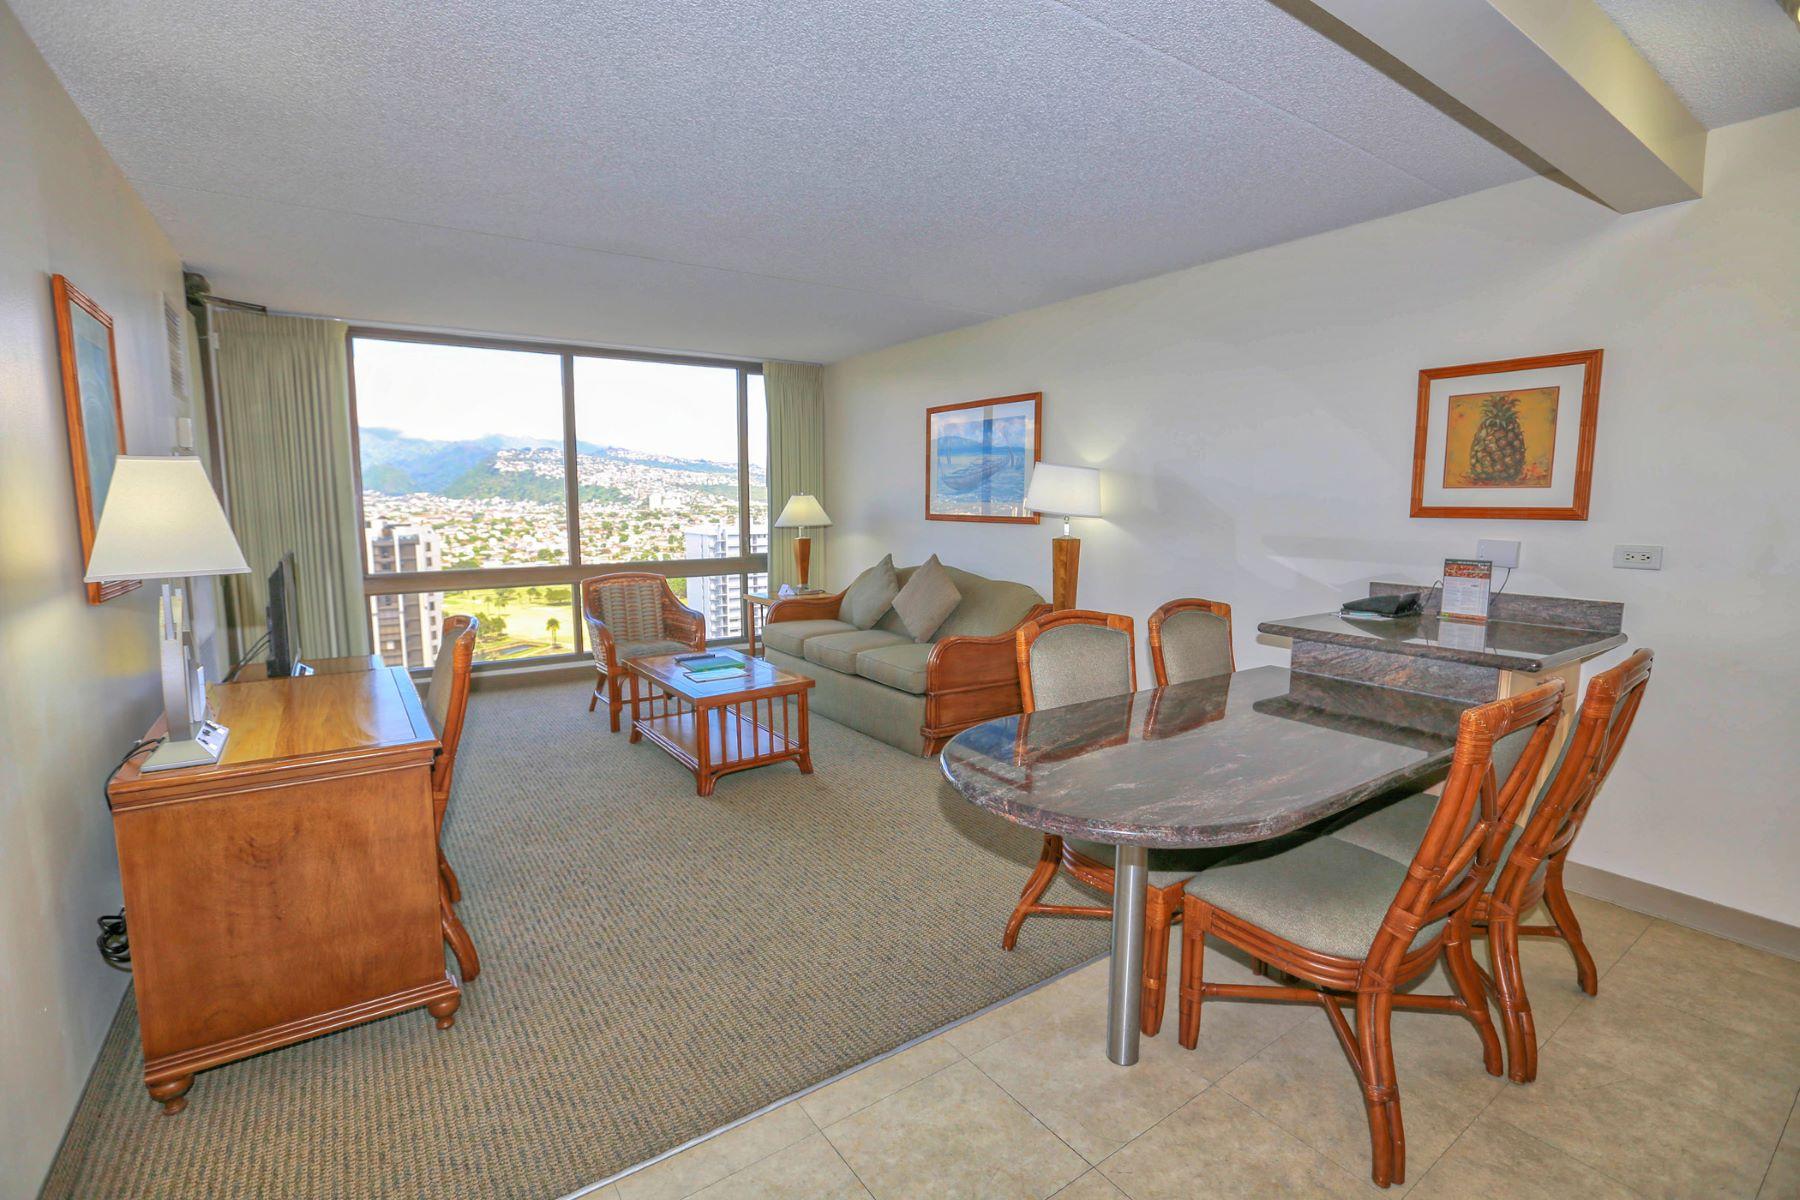 Condominium for Sale at Great Views 229 Paoakalani Ave #2809 Honolulu, Hawaii 96815 United States